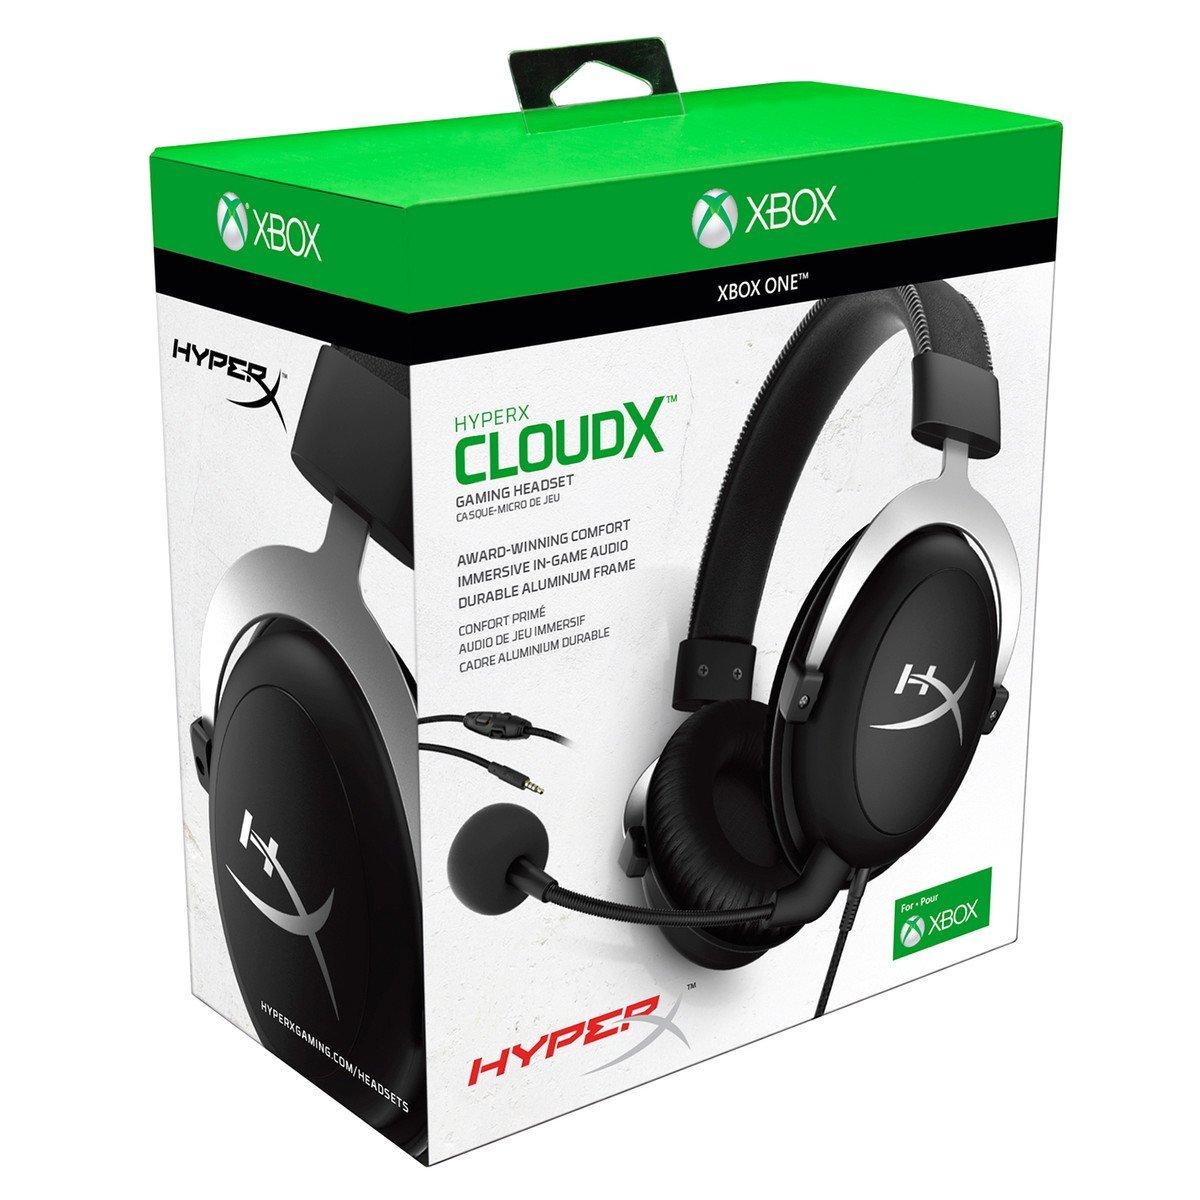 HyperX CloudX Binaural Diadema Negro Auricular con micrófono - Auriculares con micrófono (Consola de Videojuegos + PC/Videojuegos, Binaural, Diadema, Negro, ...